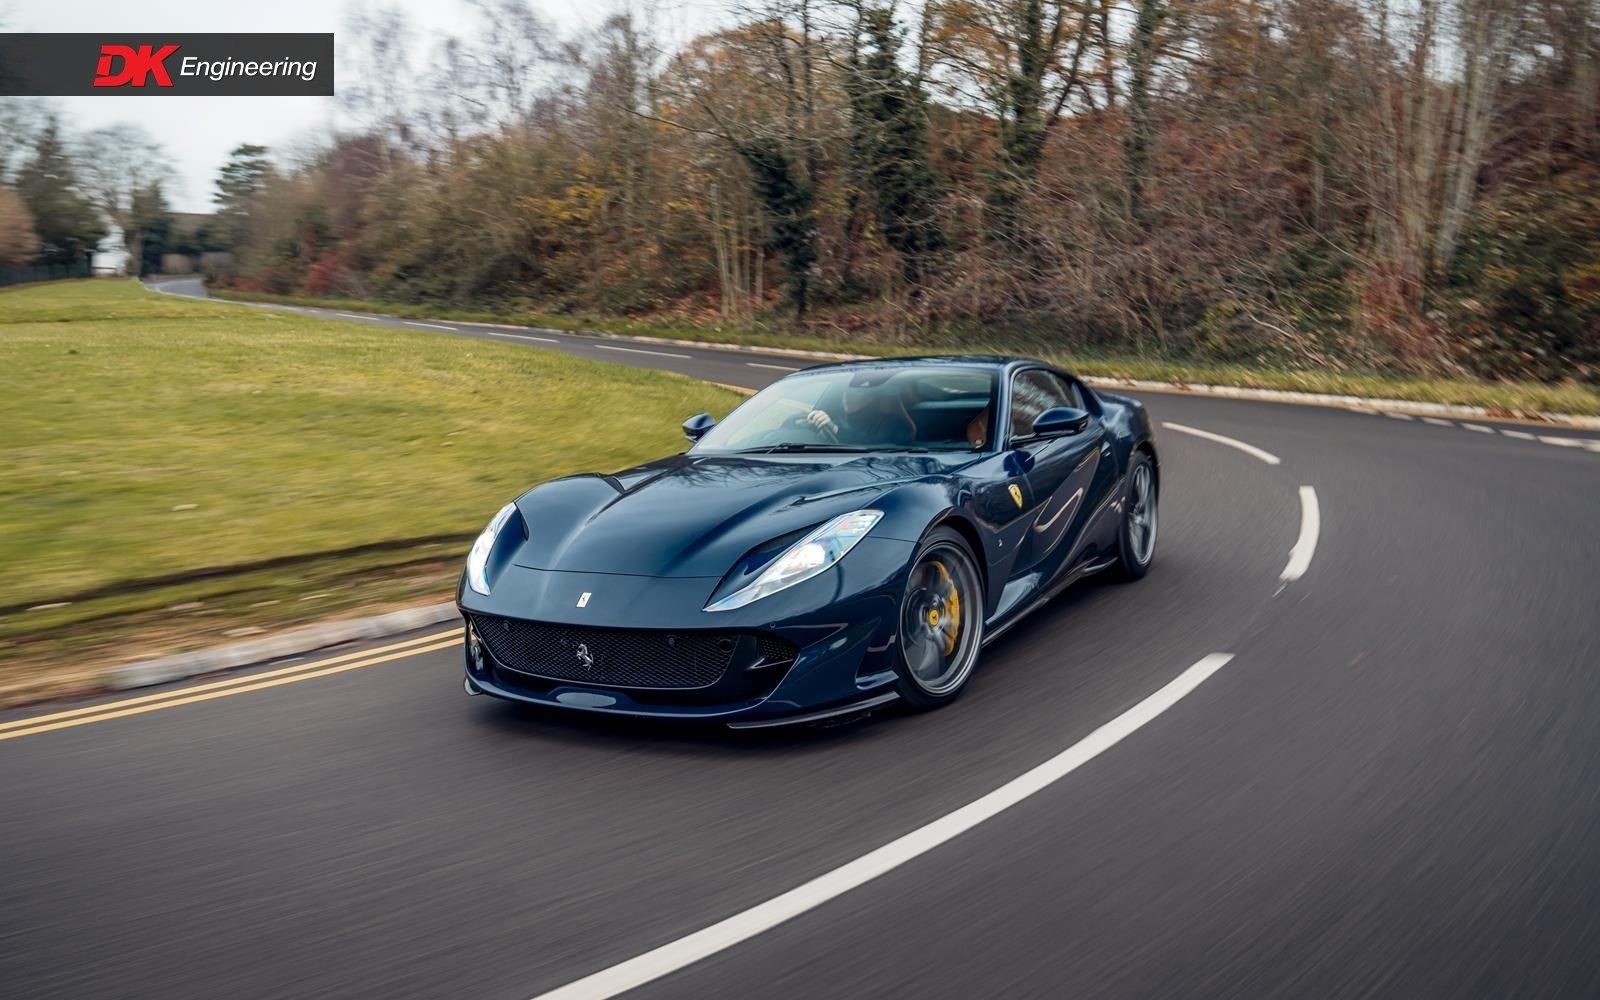 2020 Ferrari Superfast Blu Pozzi Uk Supplied In 2020 2 300 Miles Classic Driver Market